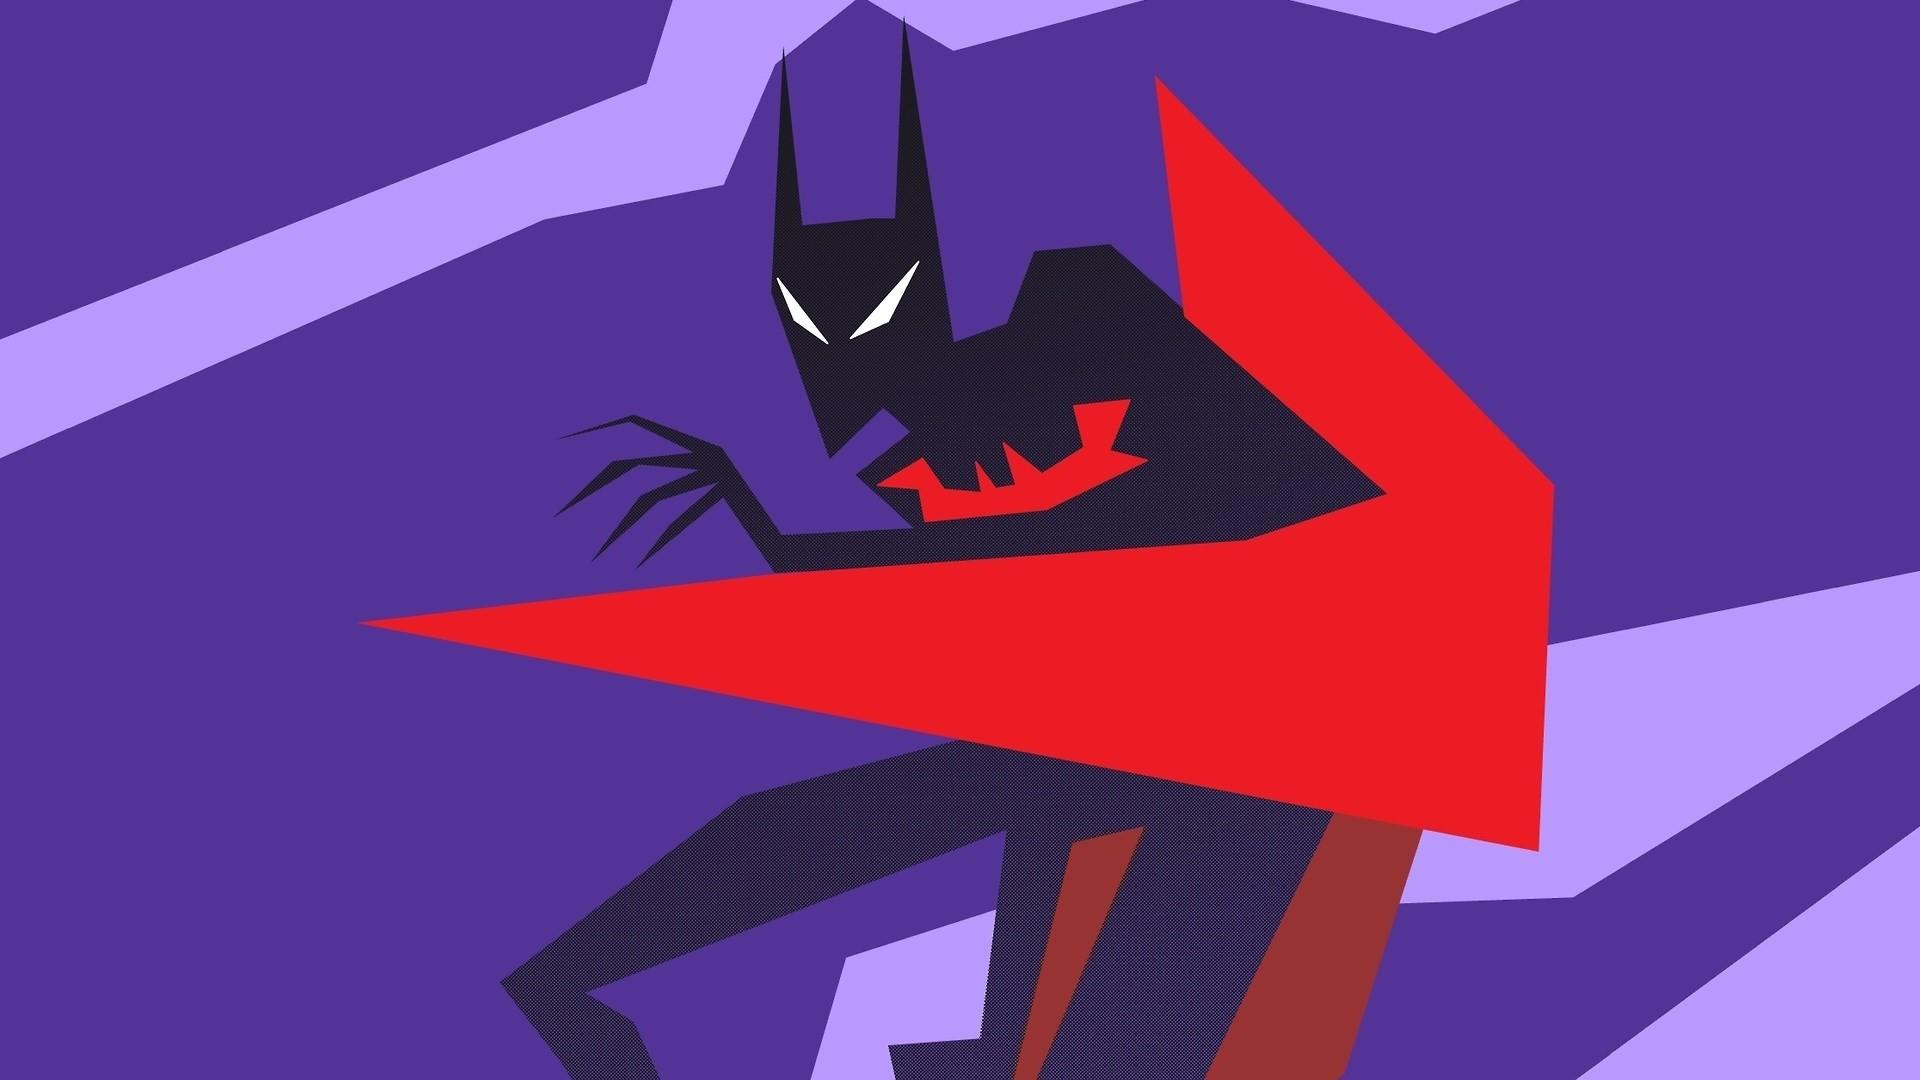 batman beyond wallpapers for mac desktop, Wilford Jones 2017-03-28